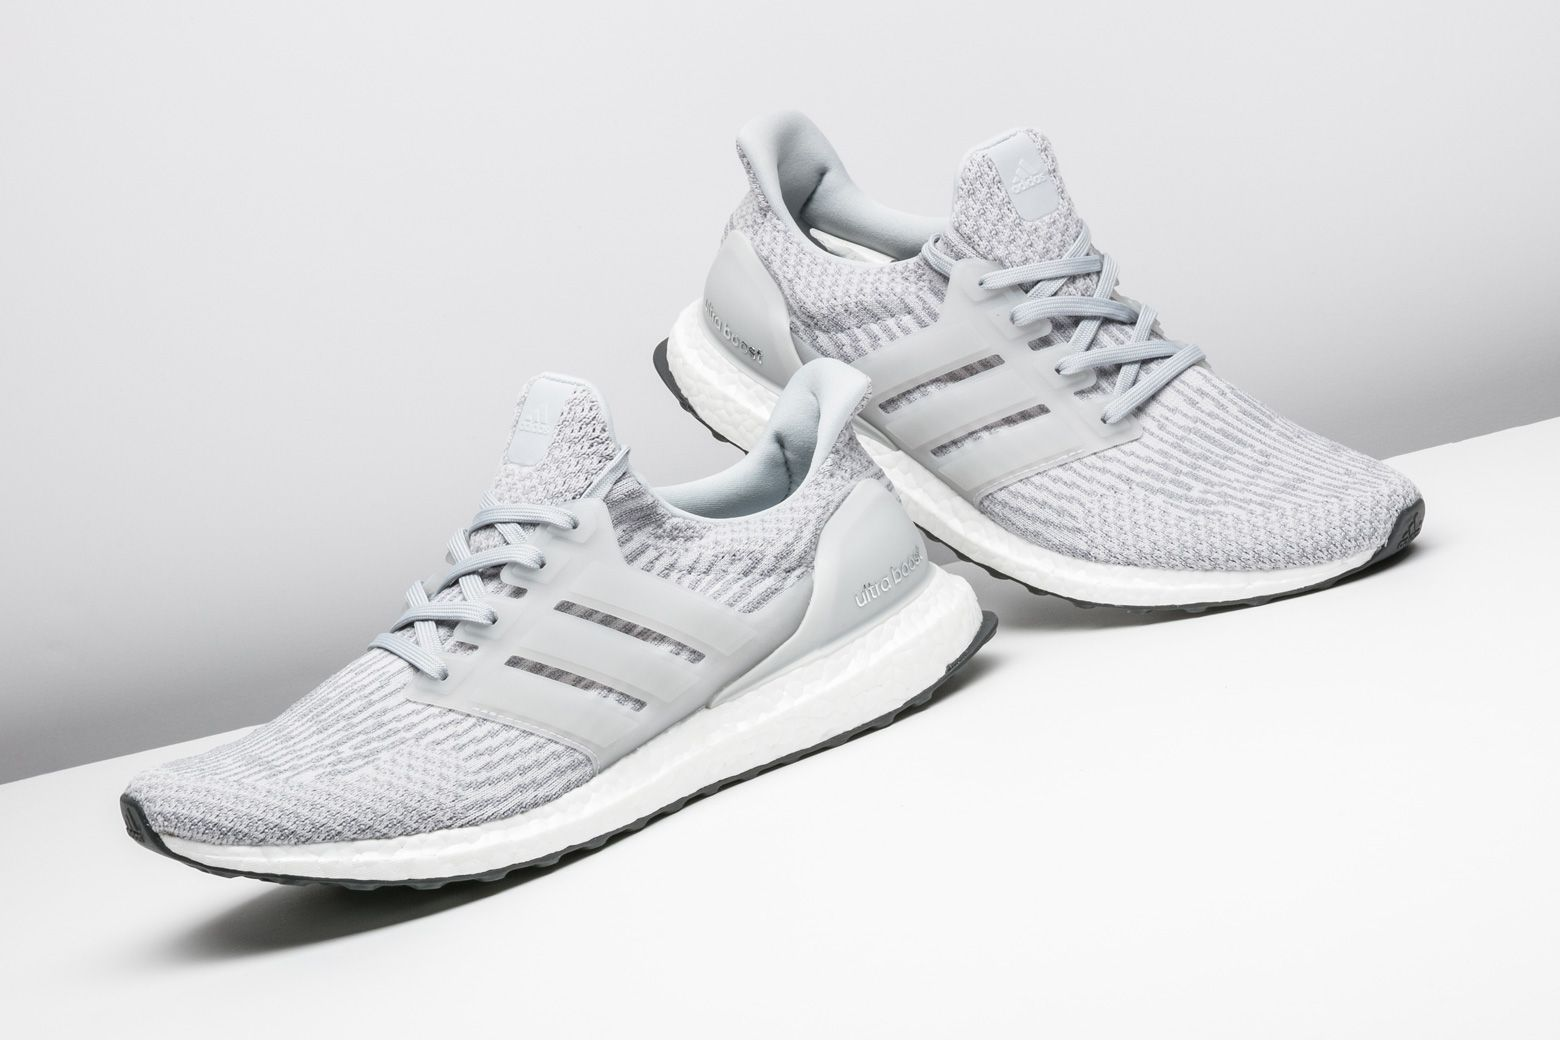 White Silver Womens Green Adidas Ultra Boost Shoes Fashion Likeness